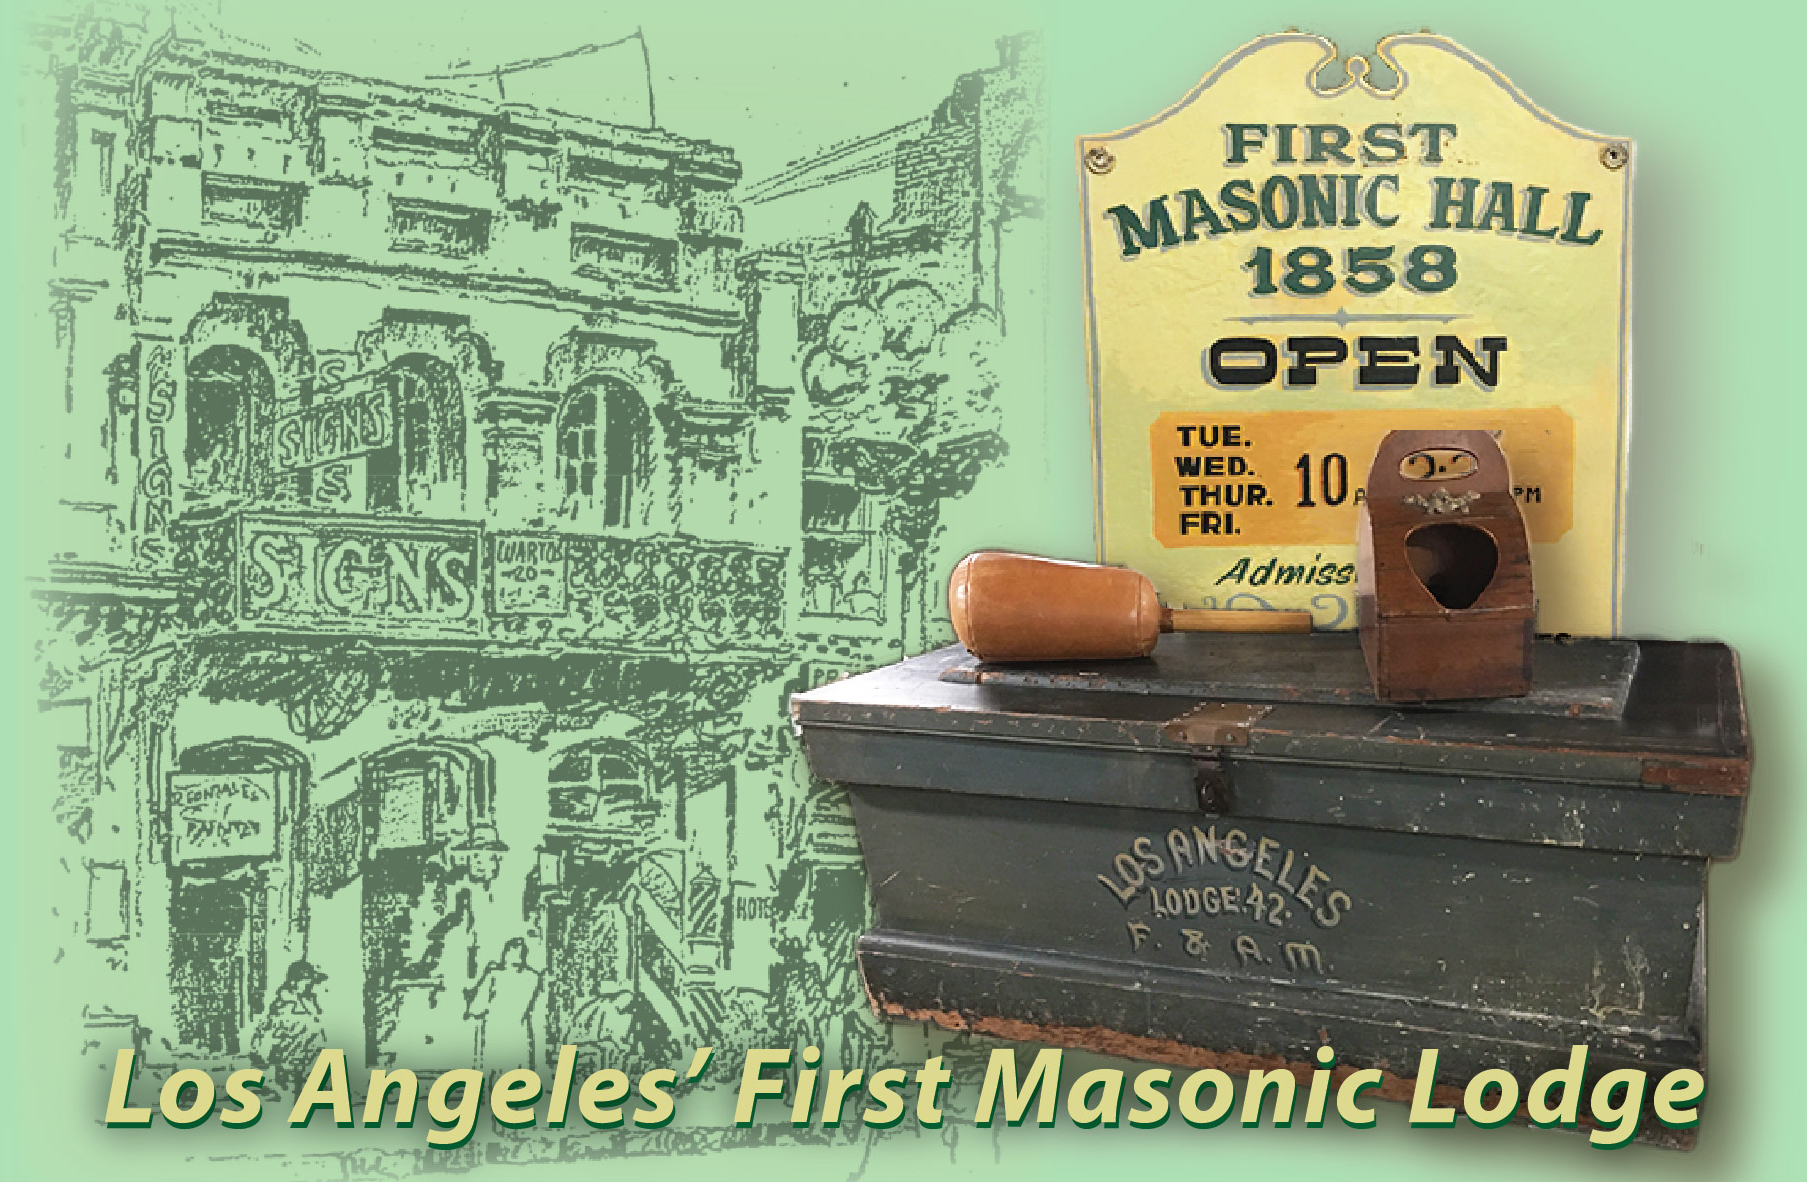 first masonic hall